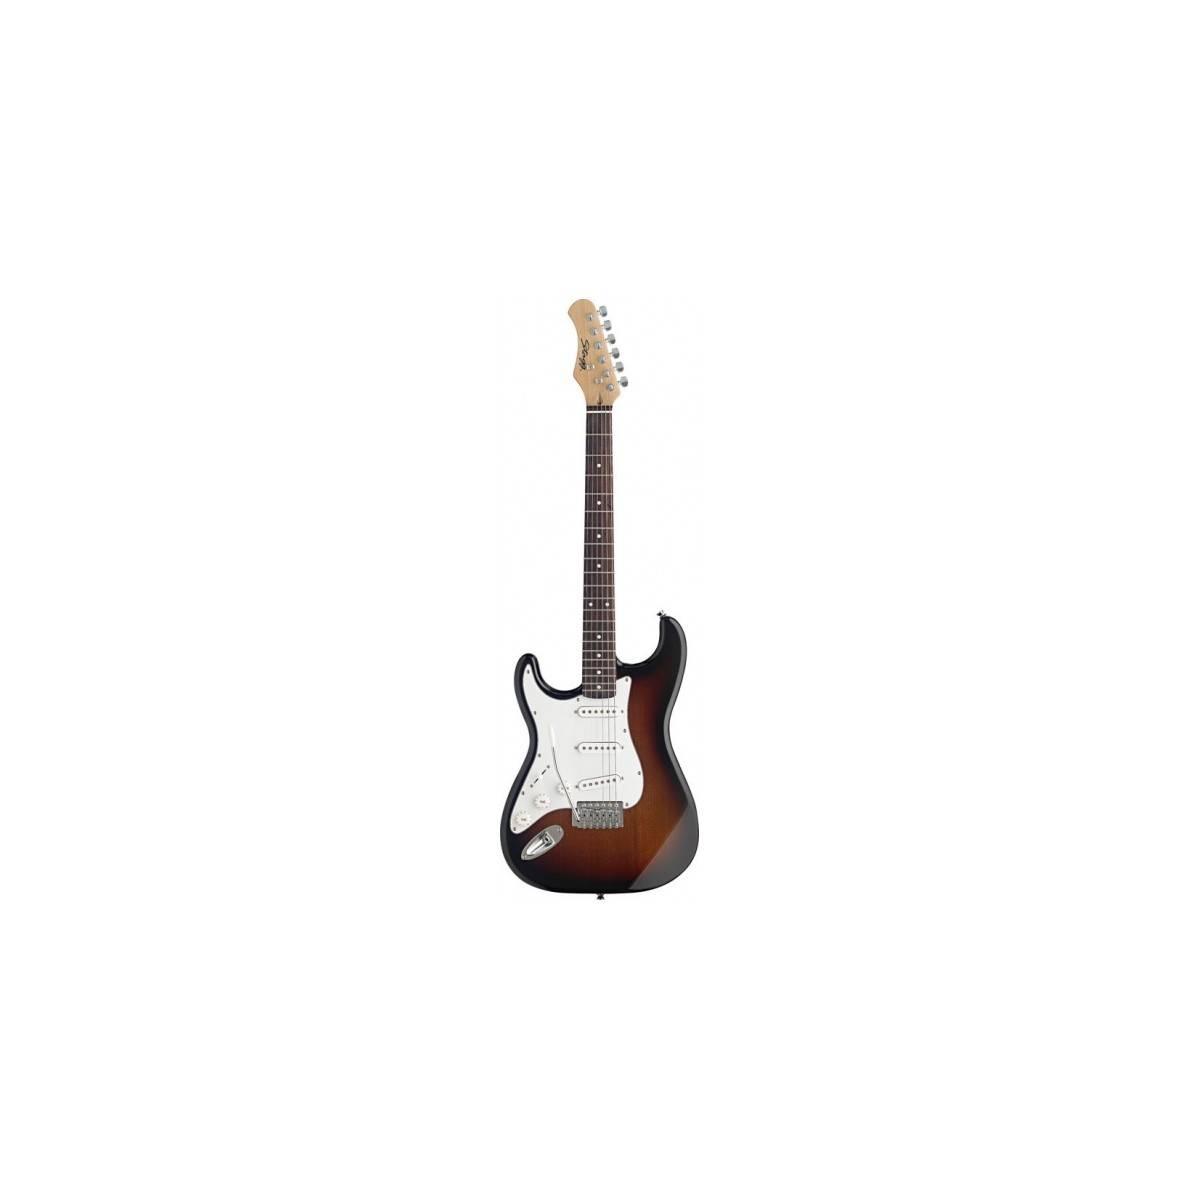 Guitare Electrique Gaucher type S Sunburst